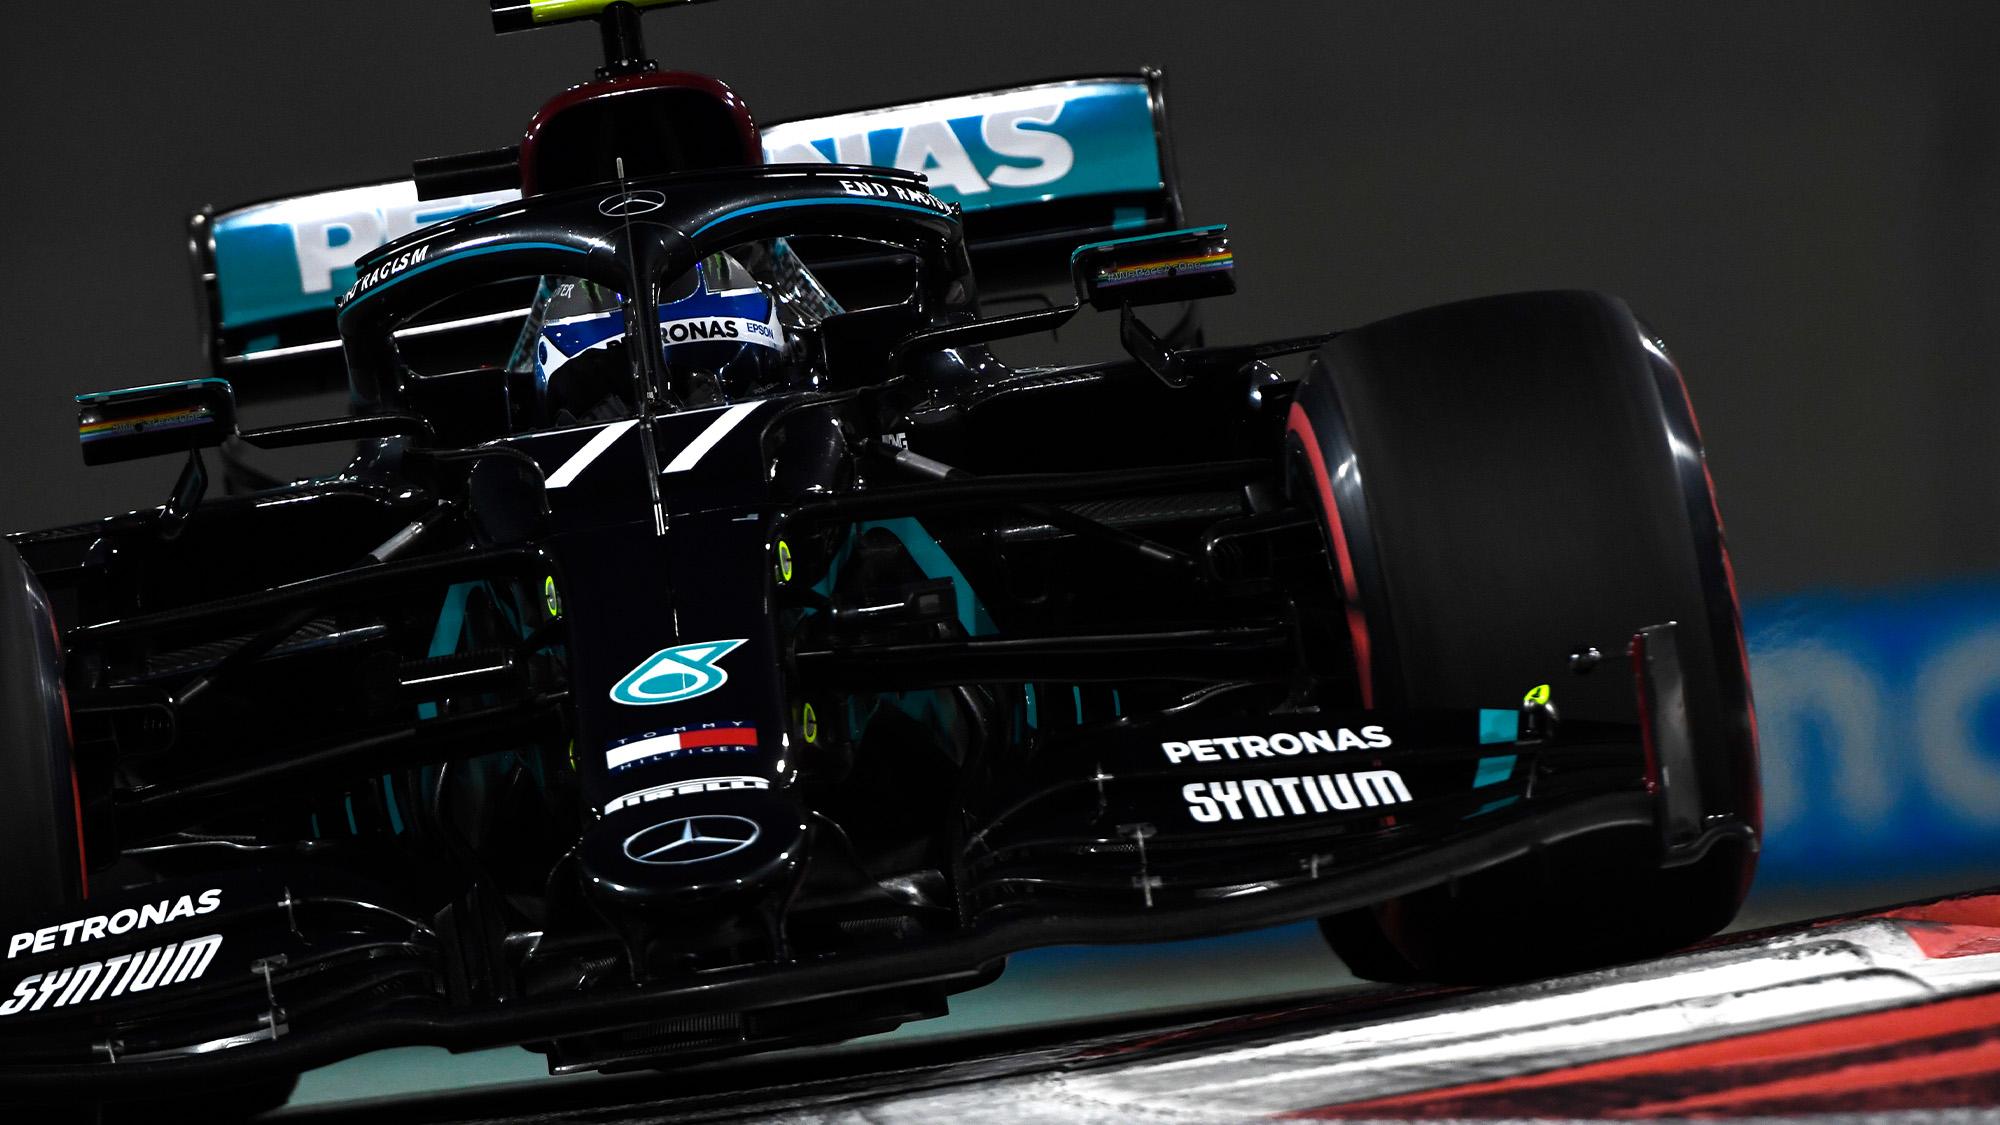 Valtteri Bottas in qualifying for the 2020 Abu Dhabi GP